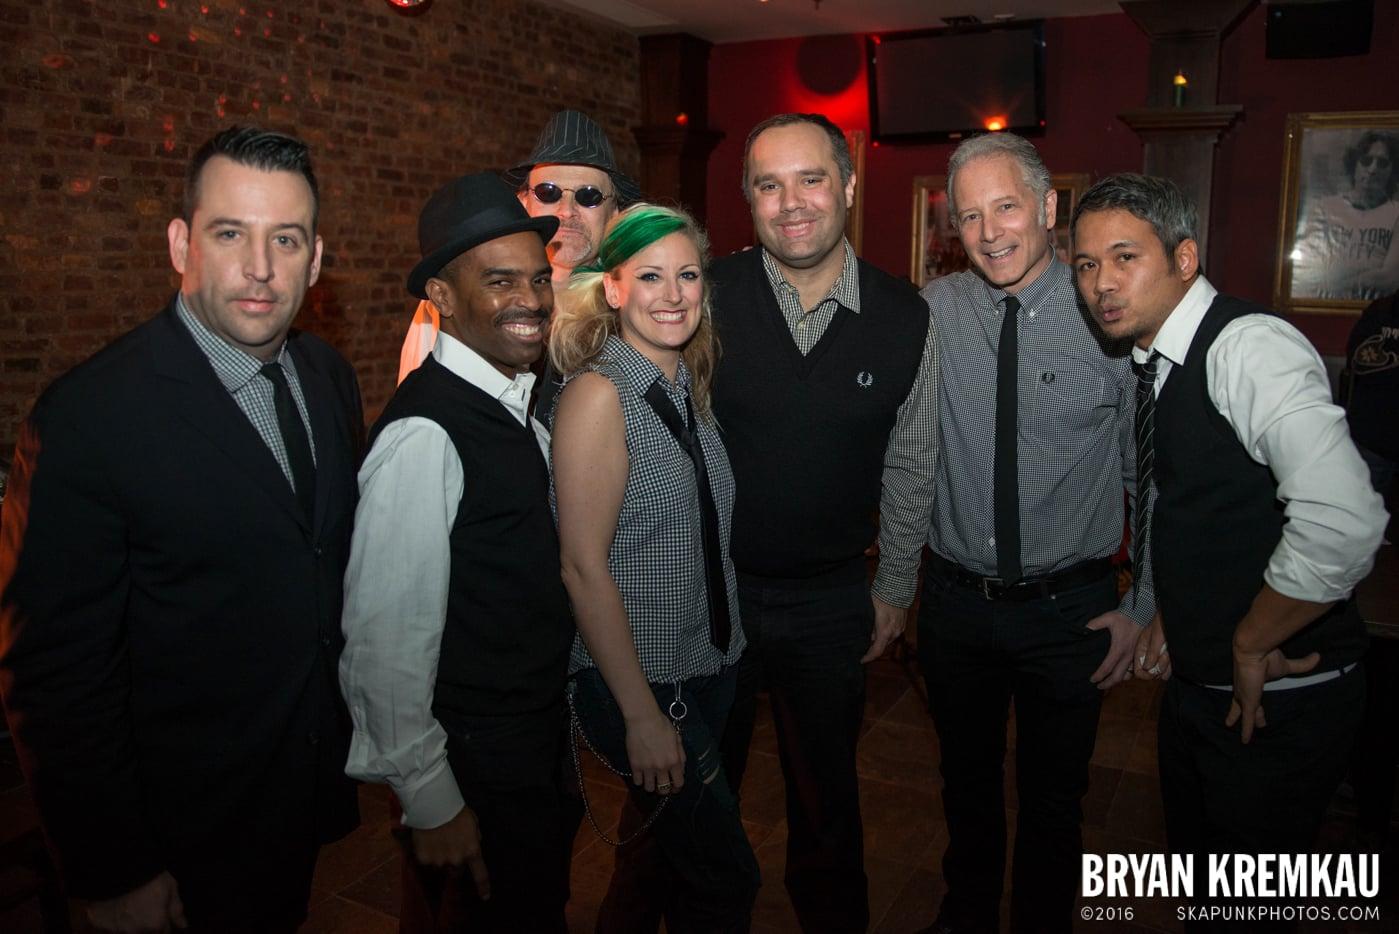 Rude Boy George @ Characters, NYC - 11.16.13 (40)